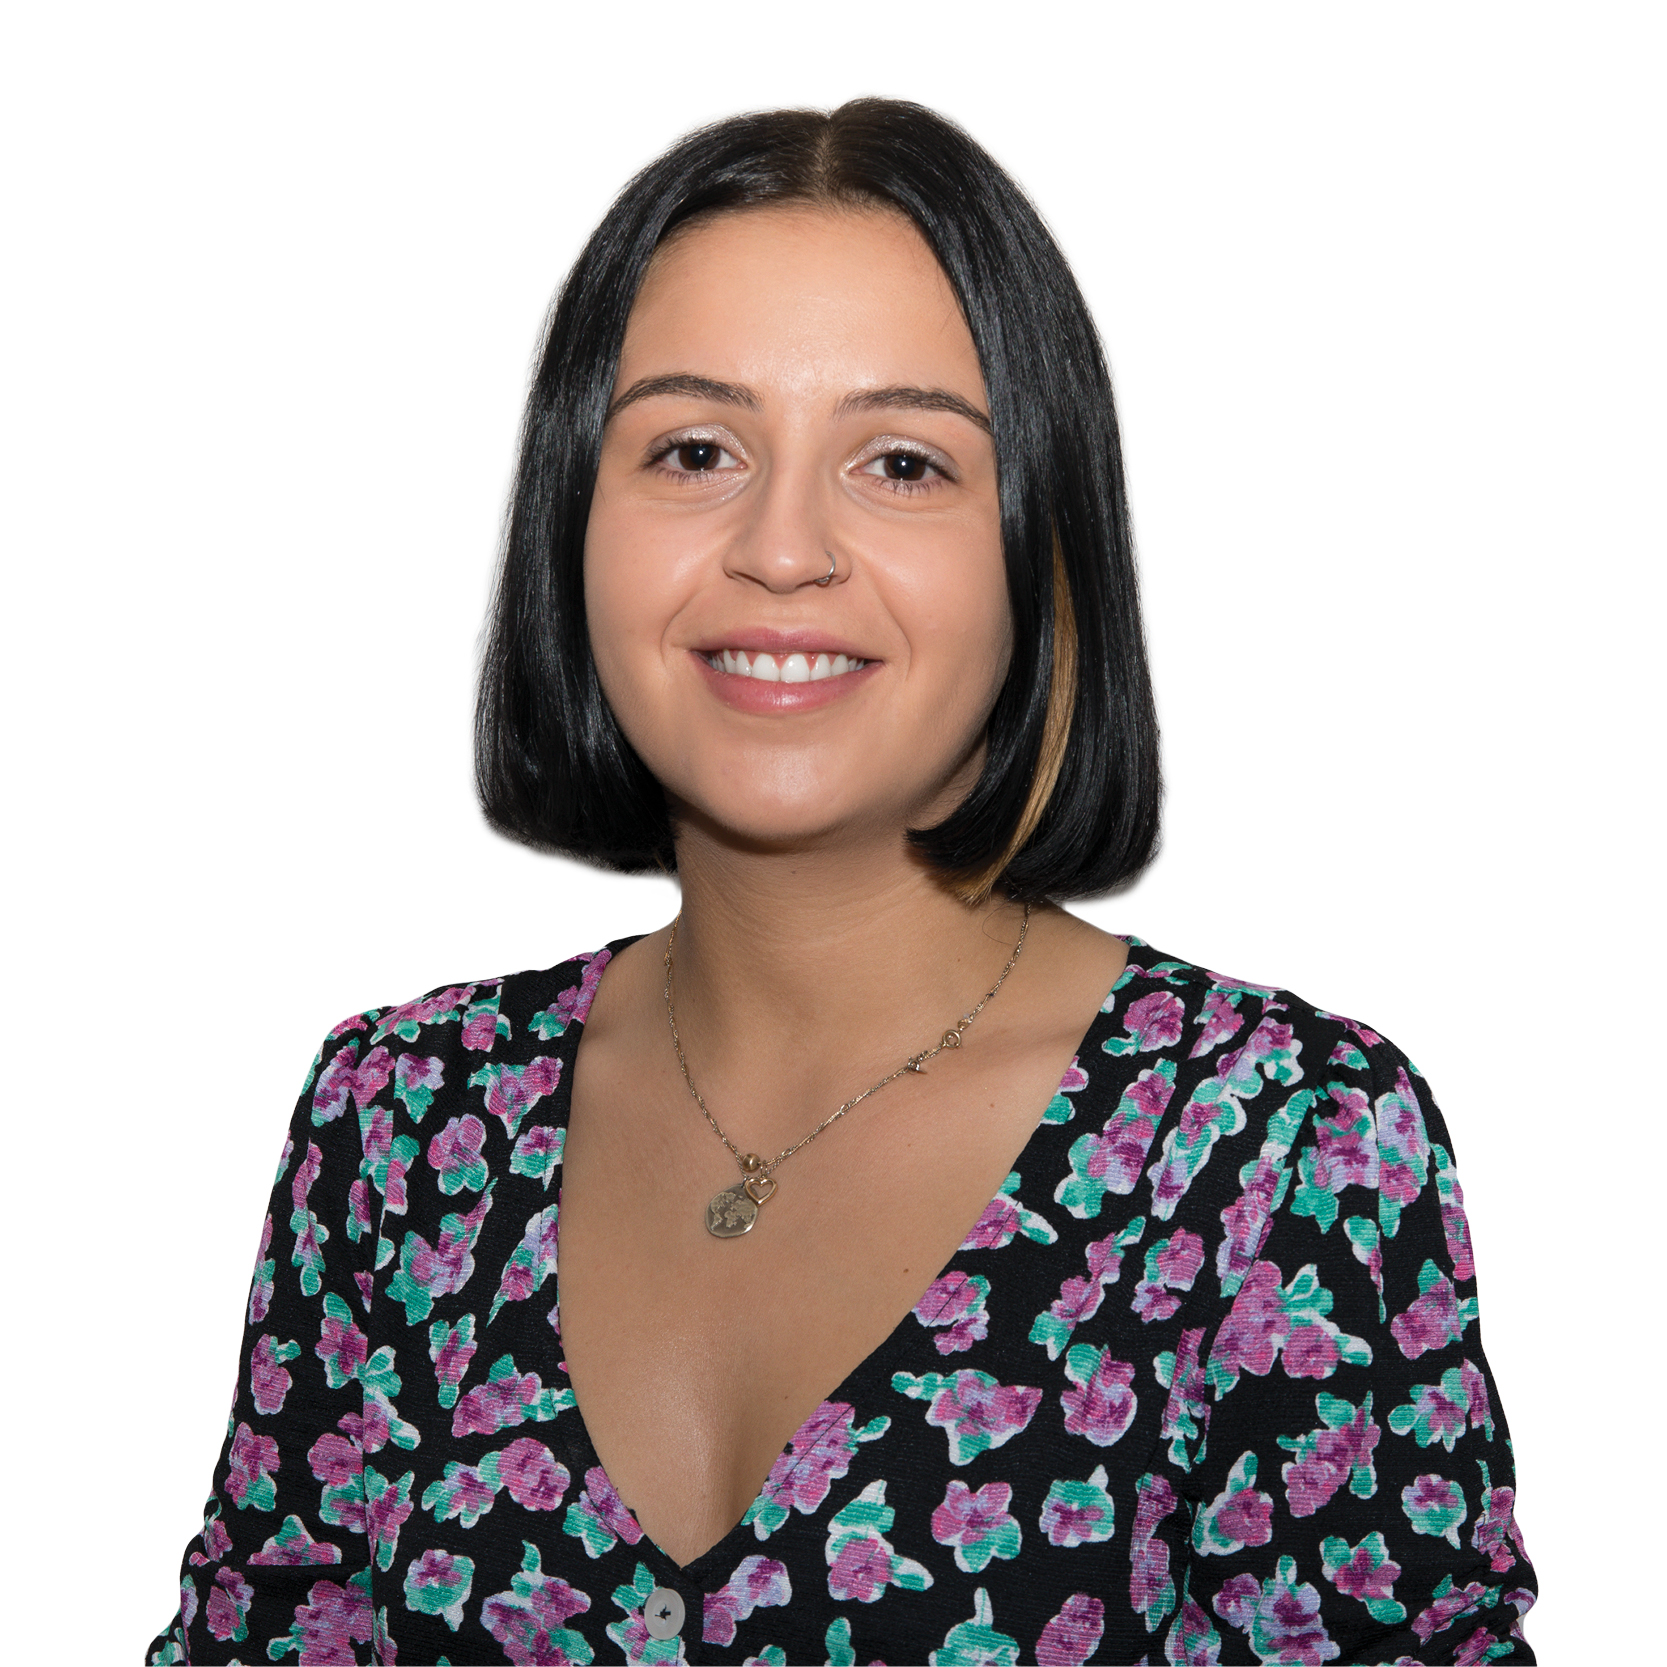 Ana Quintas